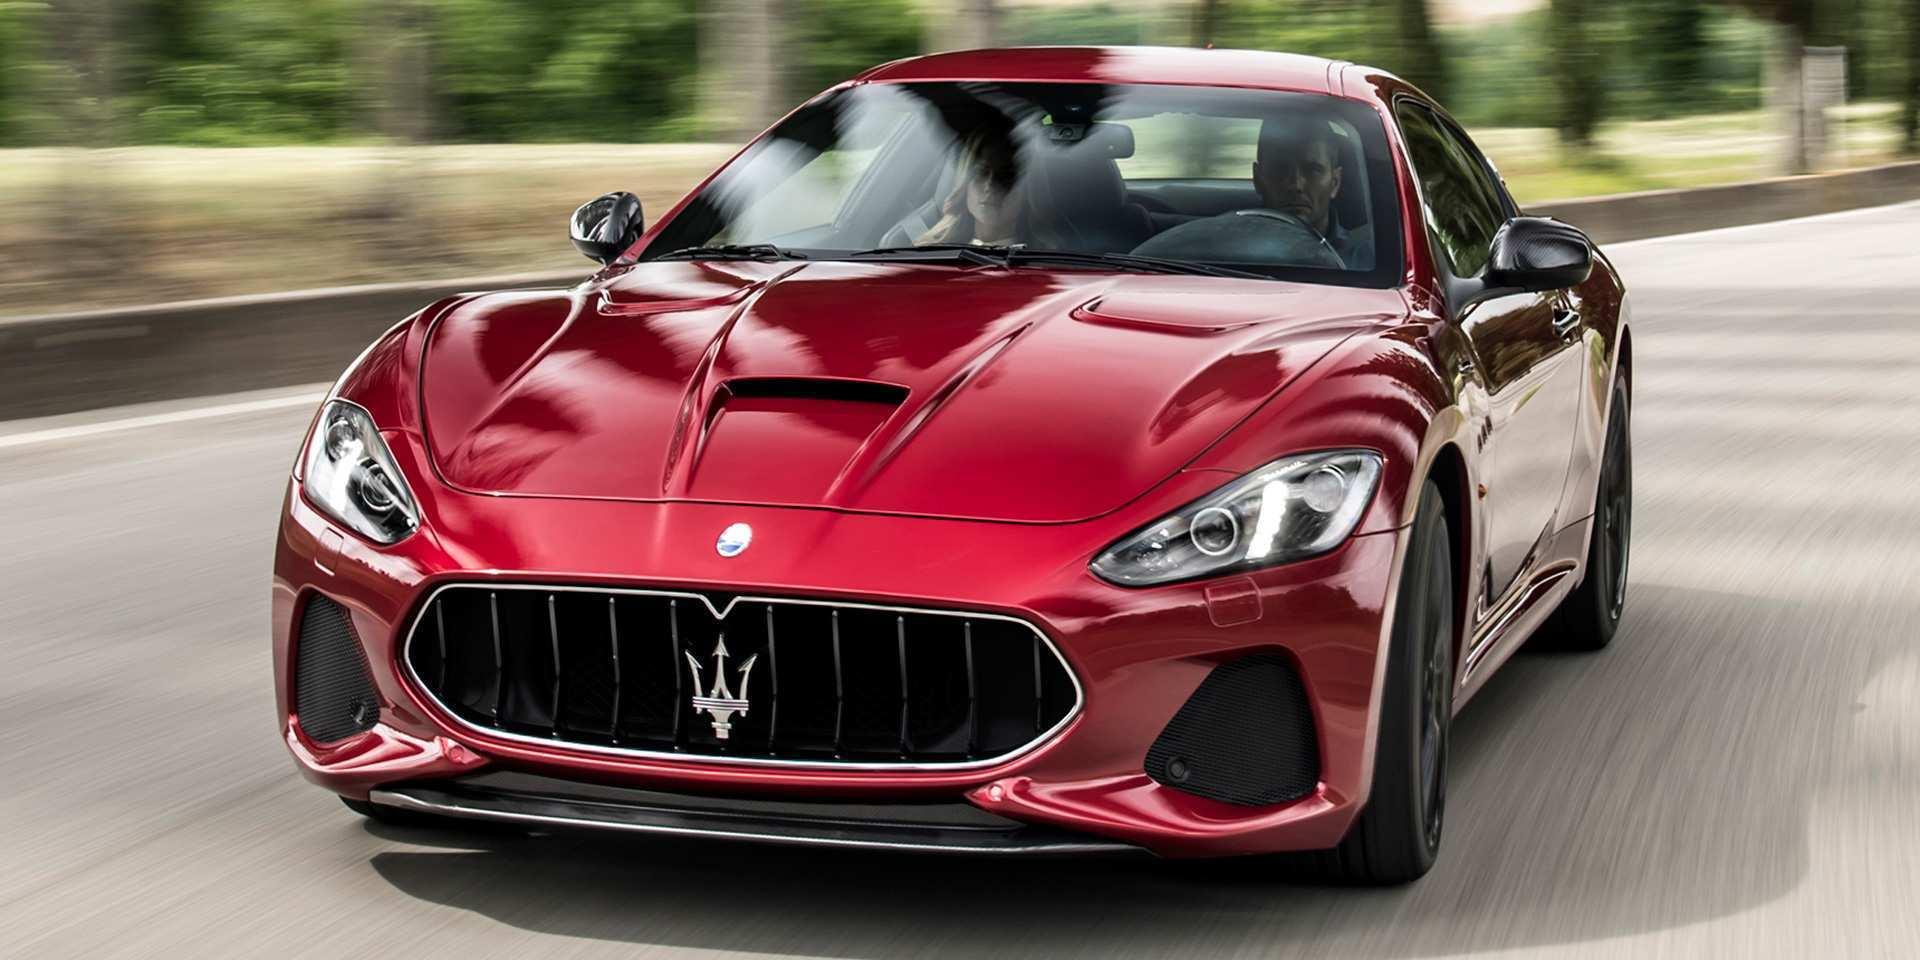 55 Best Review Maserati Granturismo 2019 Ratings with Maserati Granturismo 2019